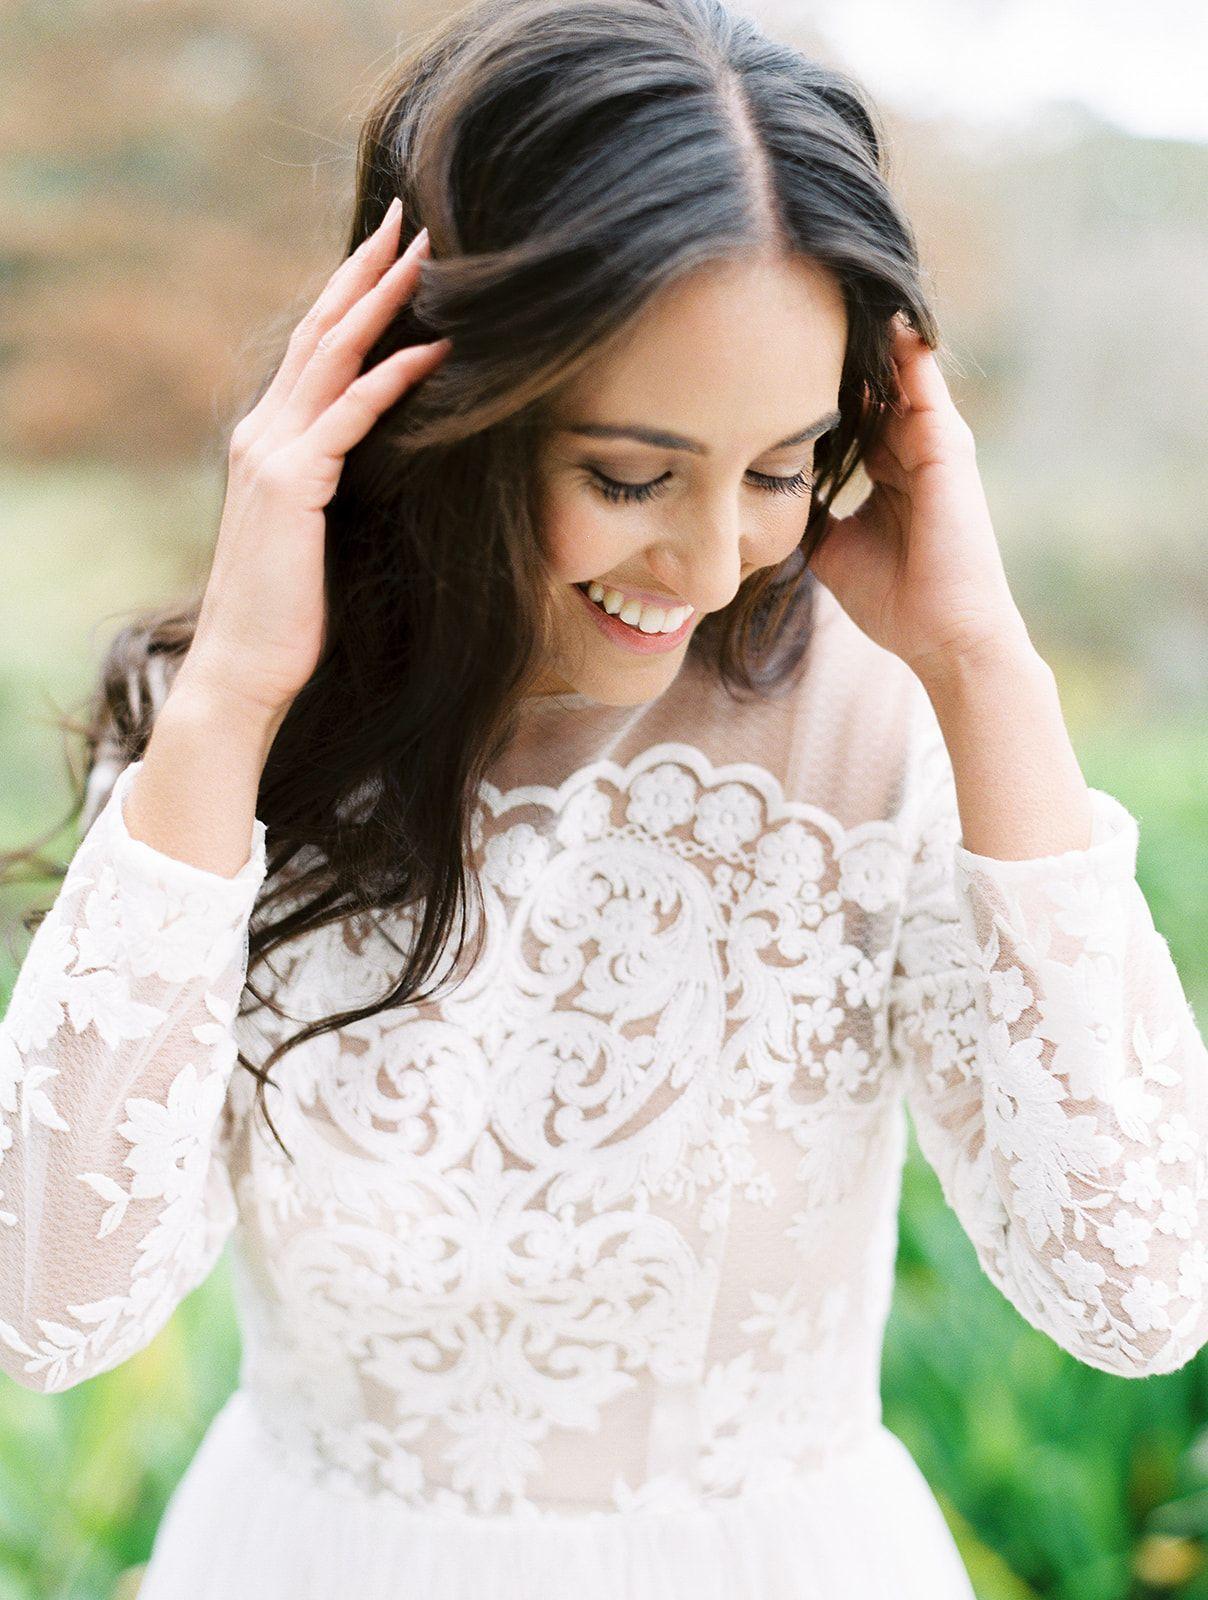 Michelle Cato Bride portrait photography, Bride portrait